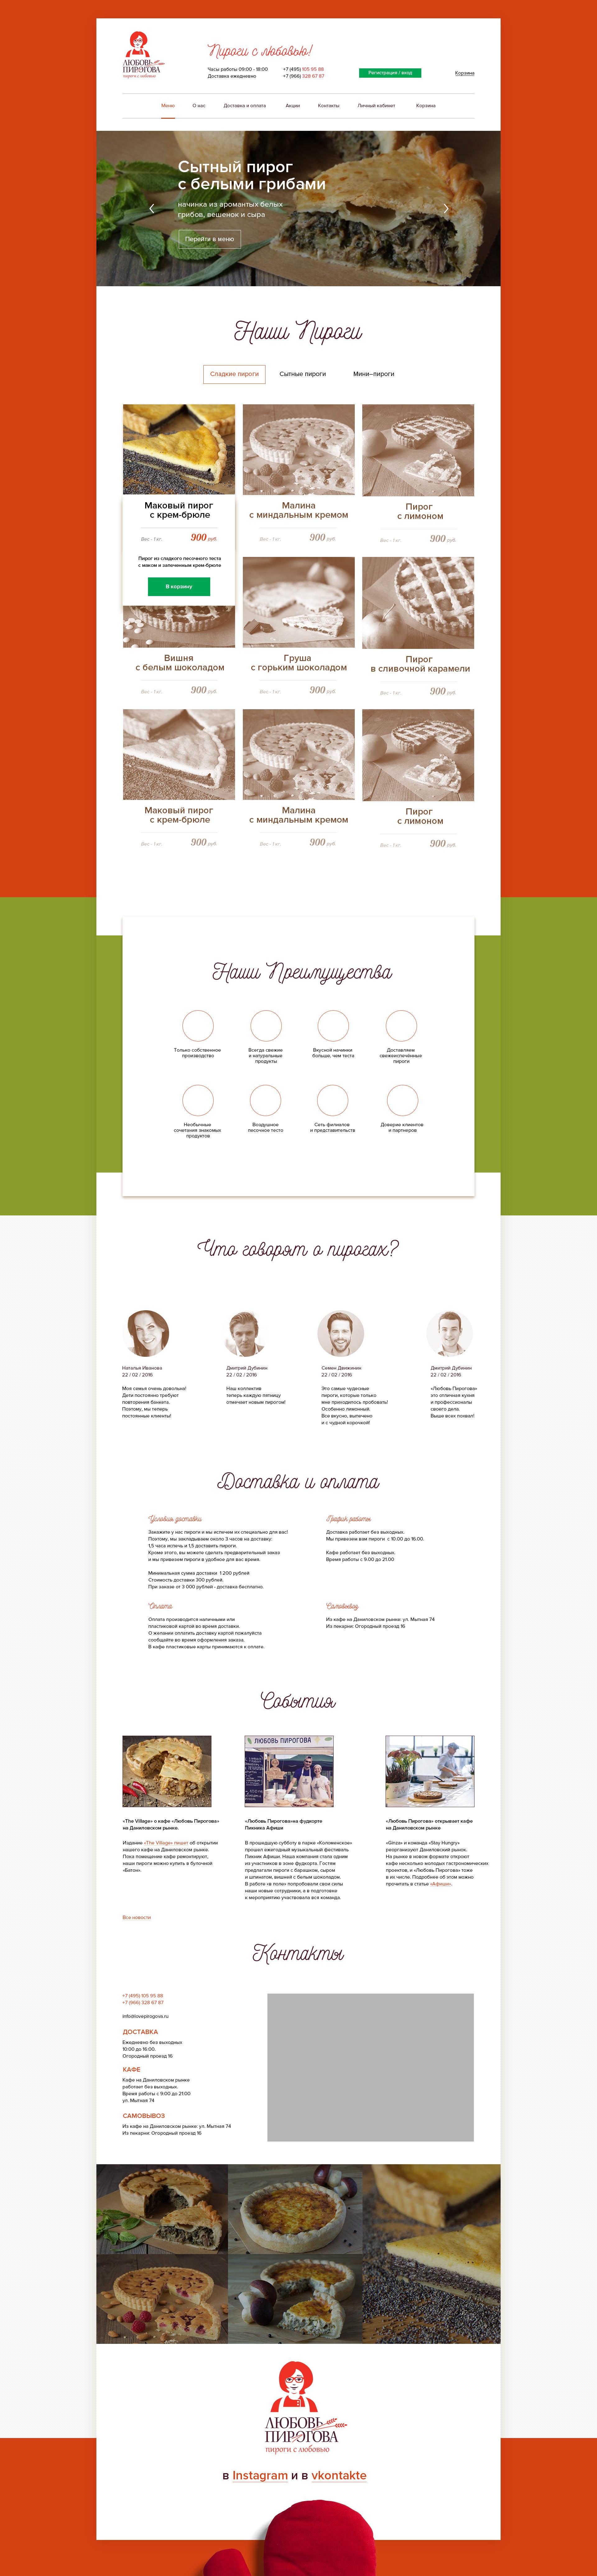 Разработка дизайна сайта lovepirogova.ru фото f_01456b633d72c005.jpg